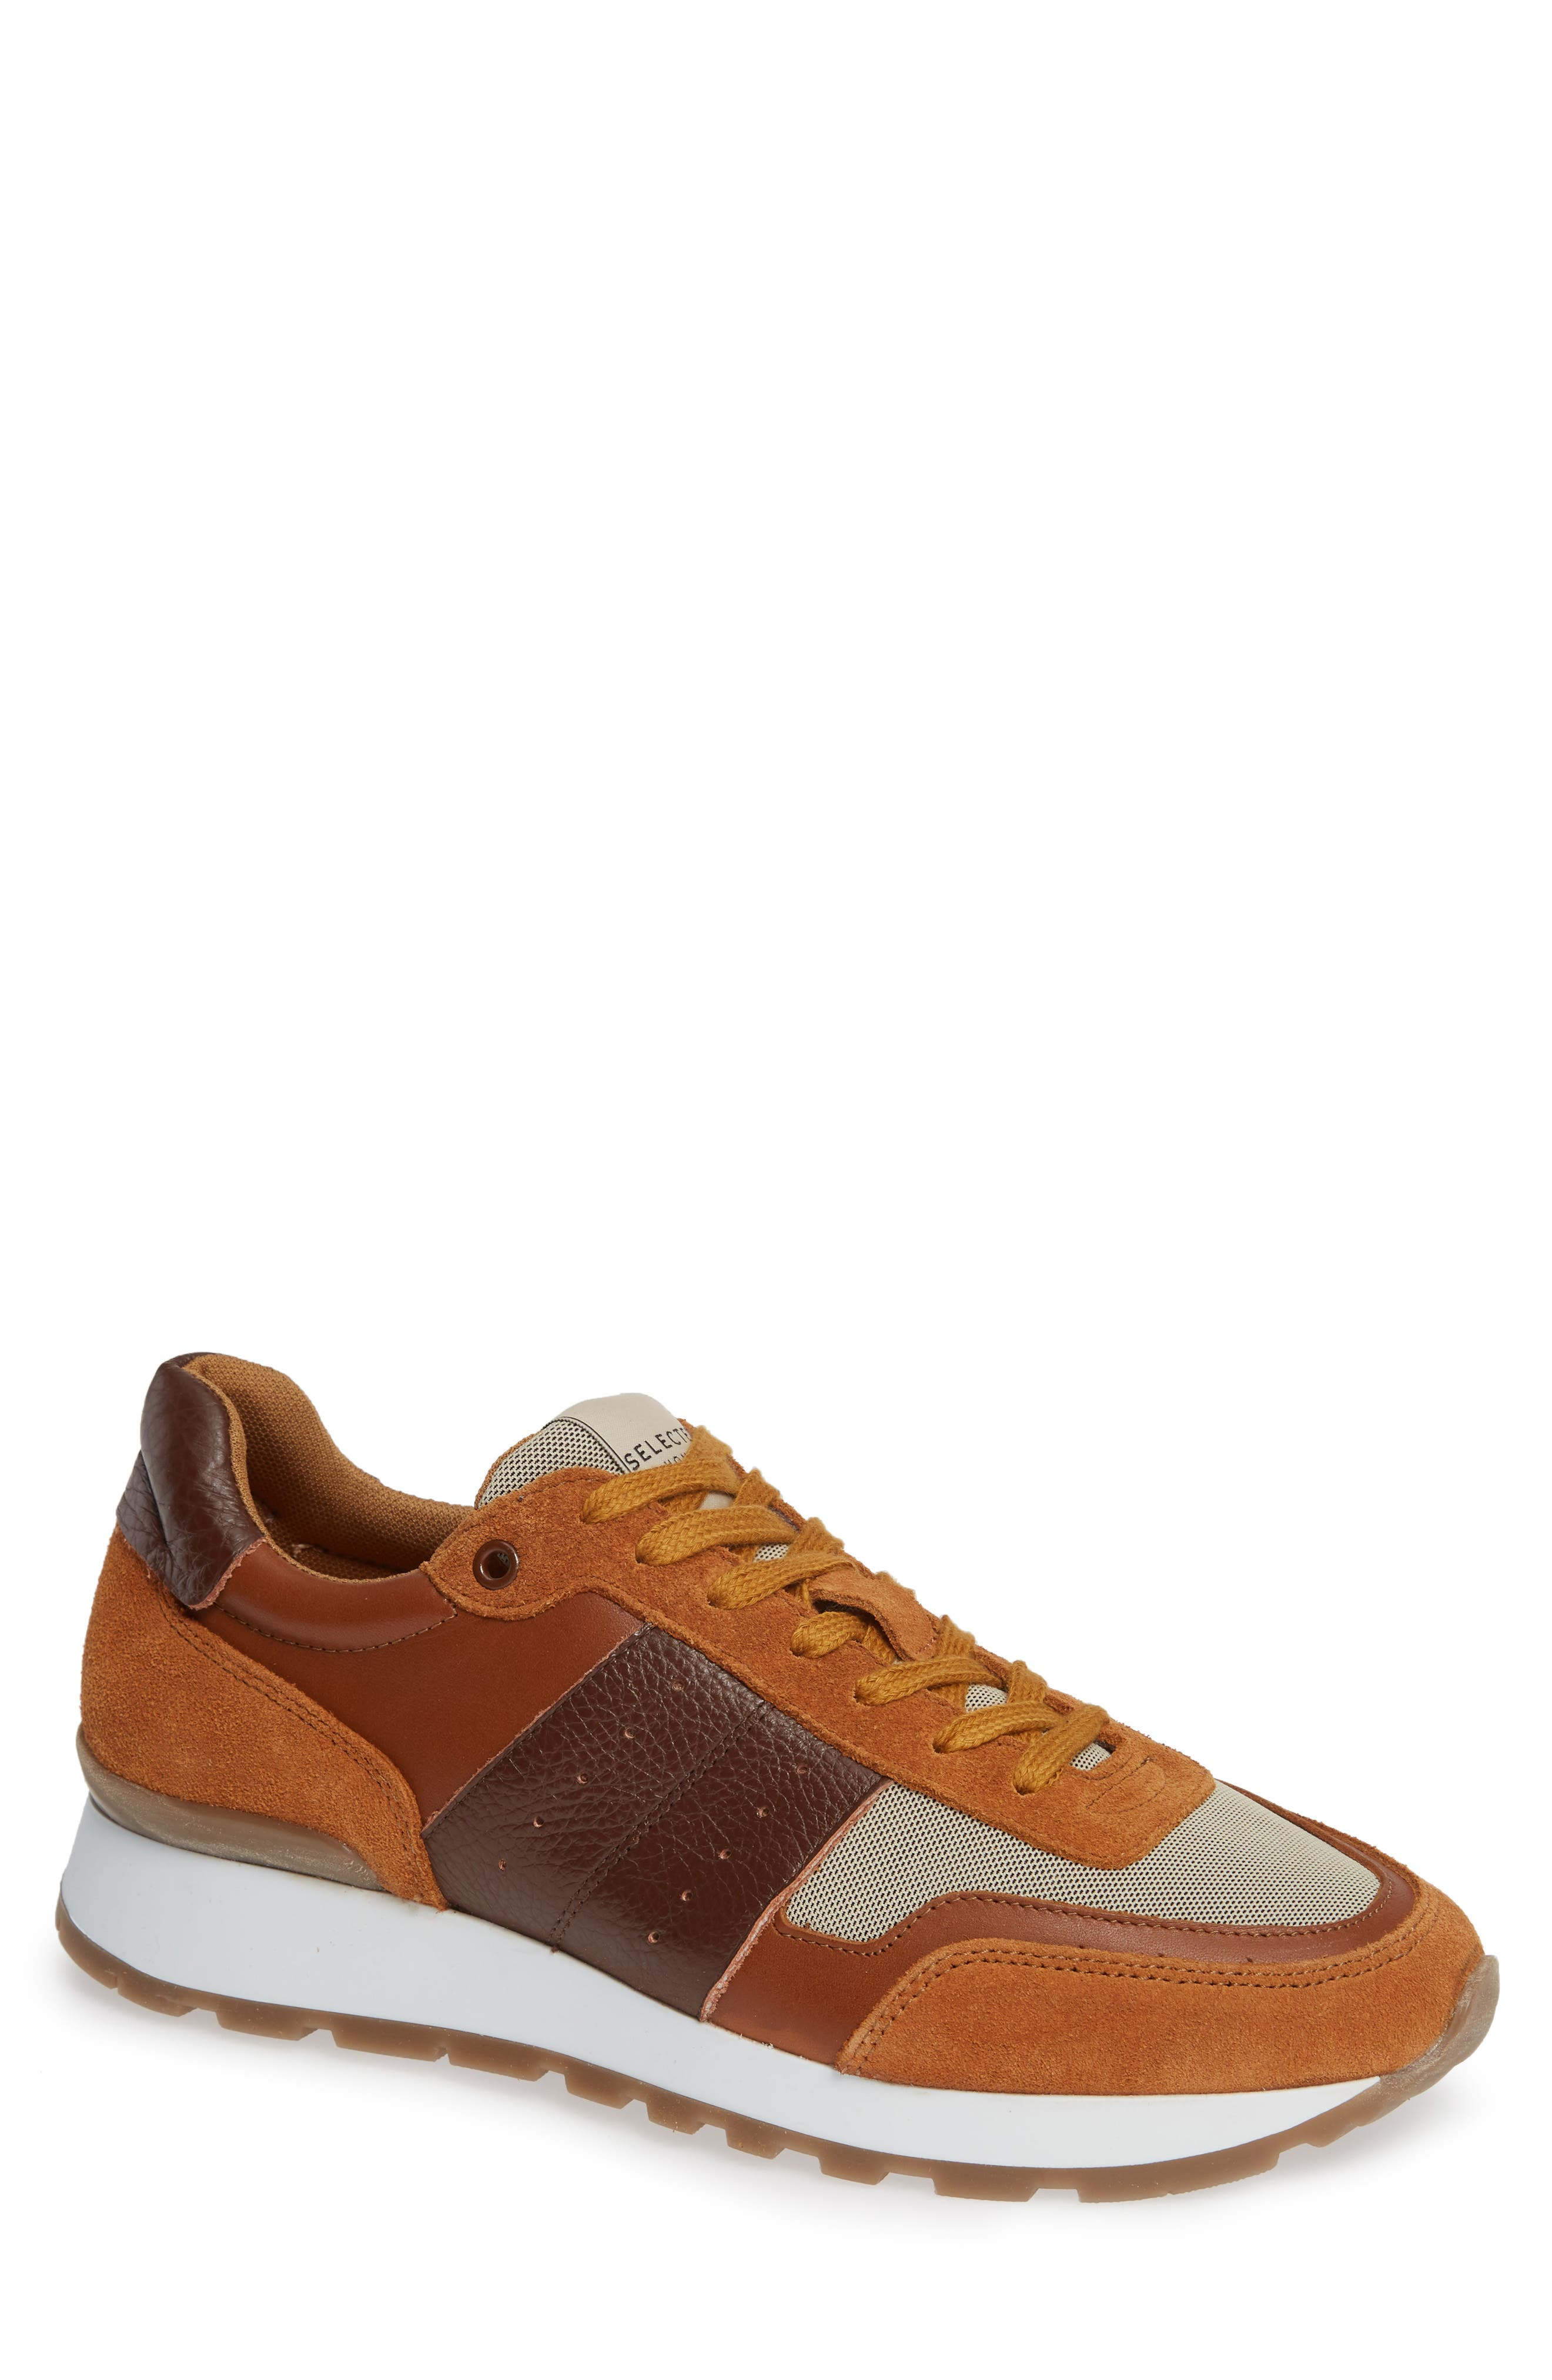 Frank Mix Sneaker,                             Main thumbnail 1, color,                             GLAZED GINGER